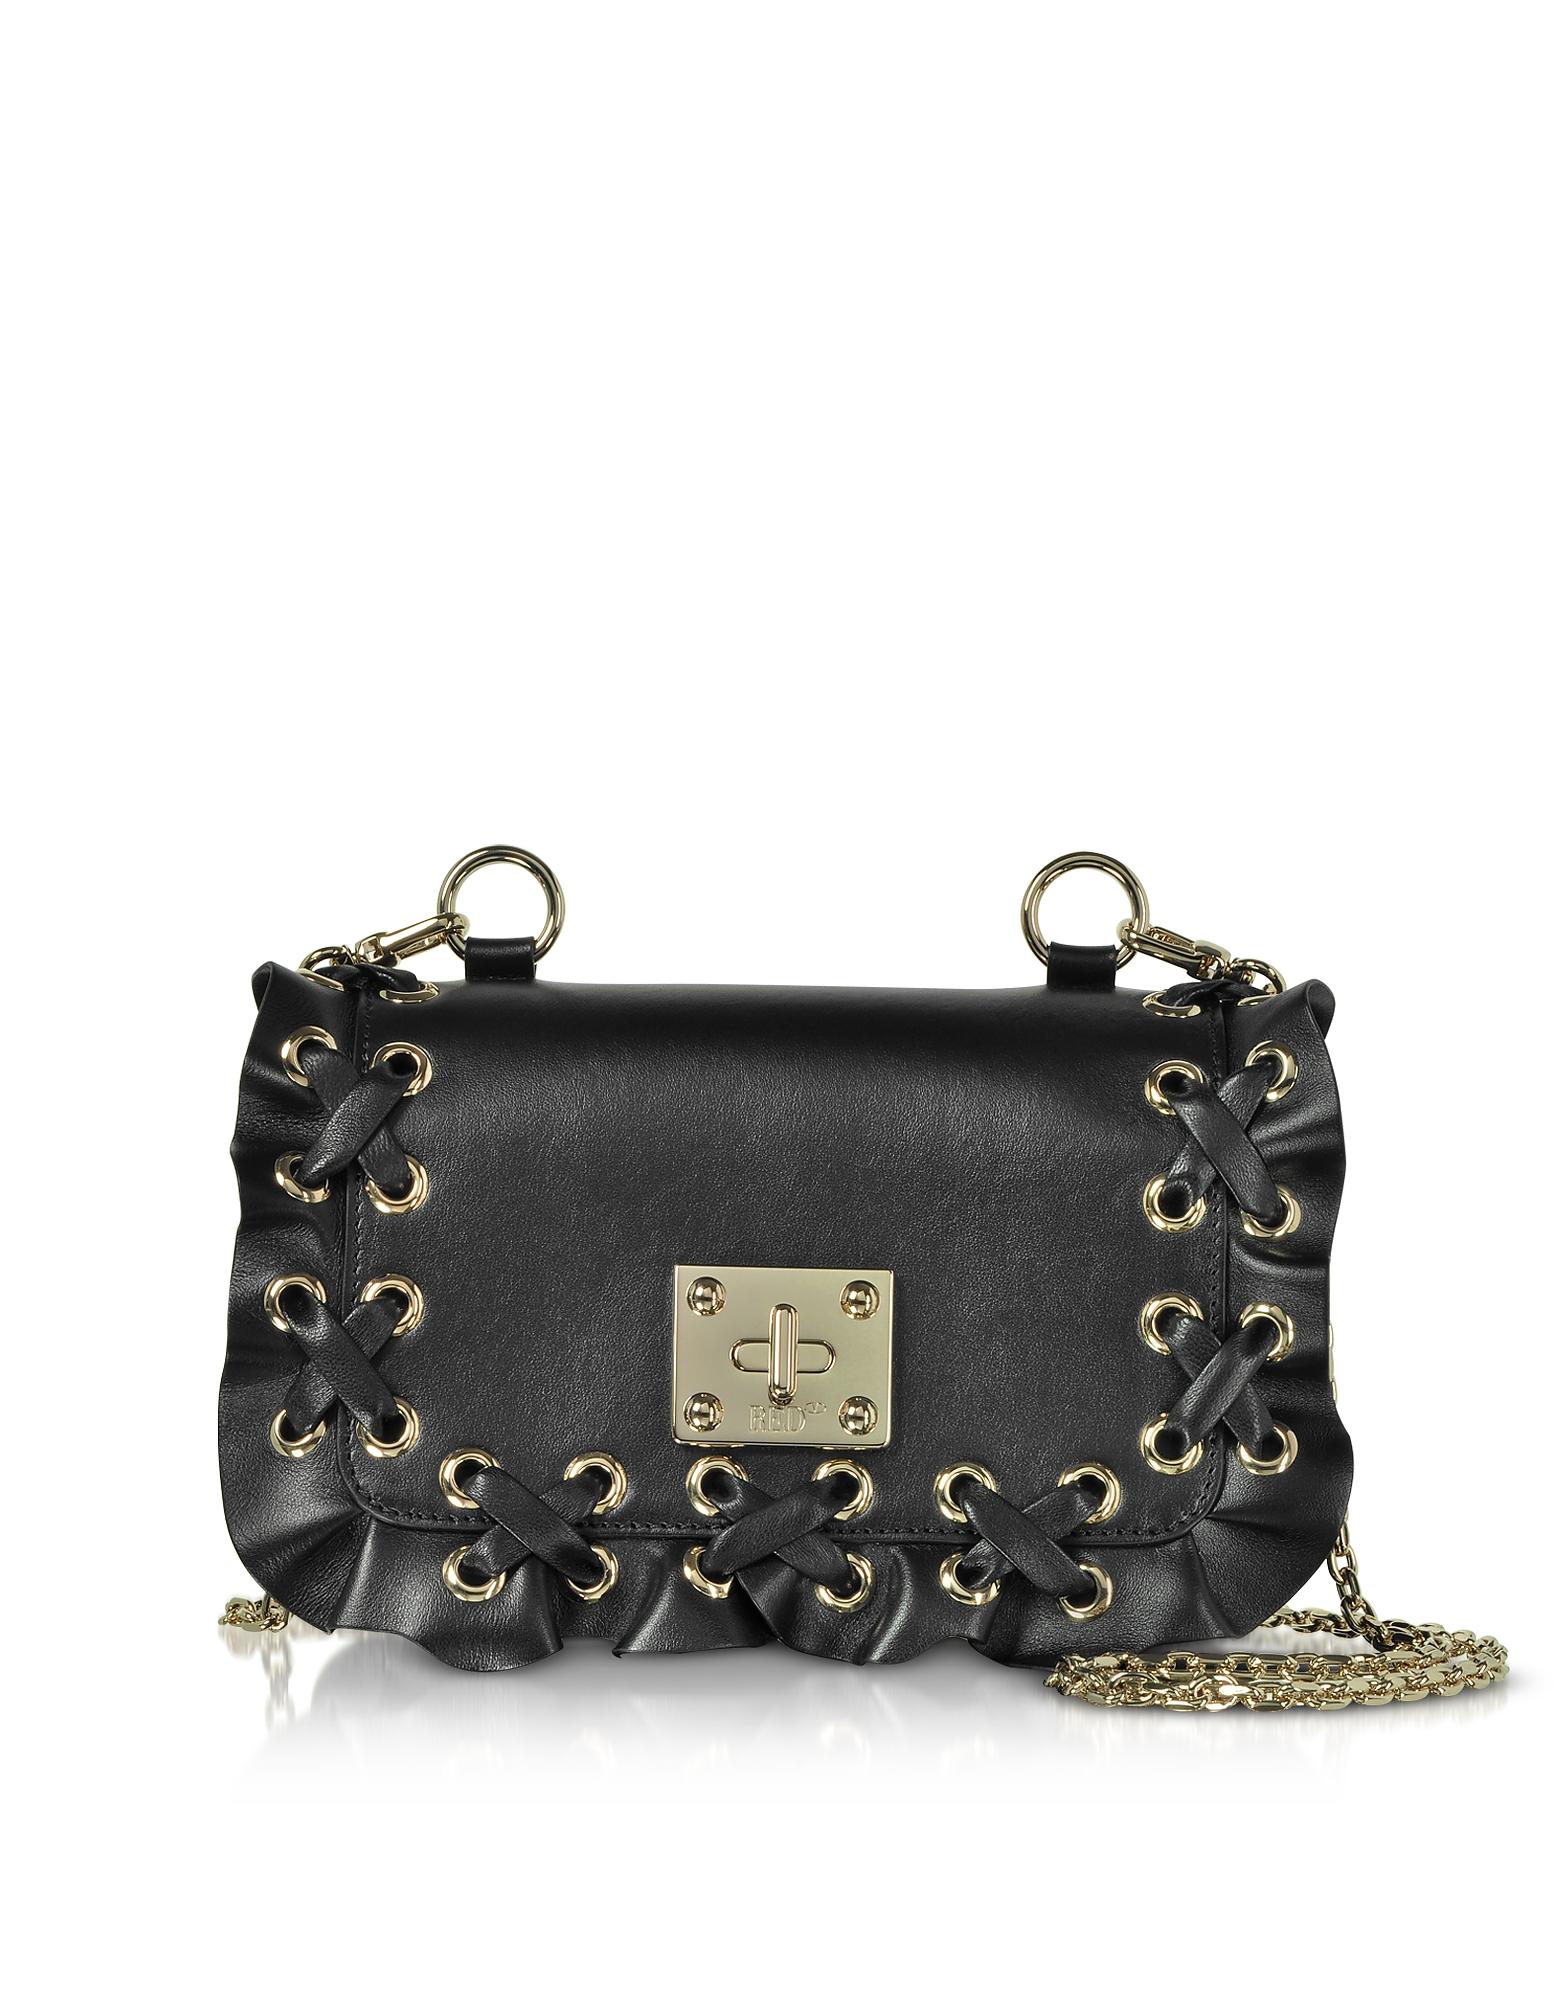 RED Valentino Handbags, Rock Ruffles Small Shoulder Bag